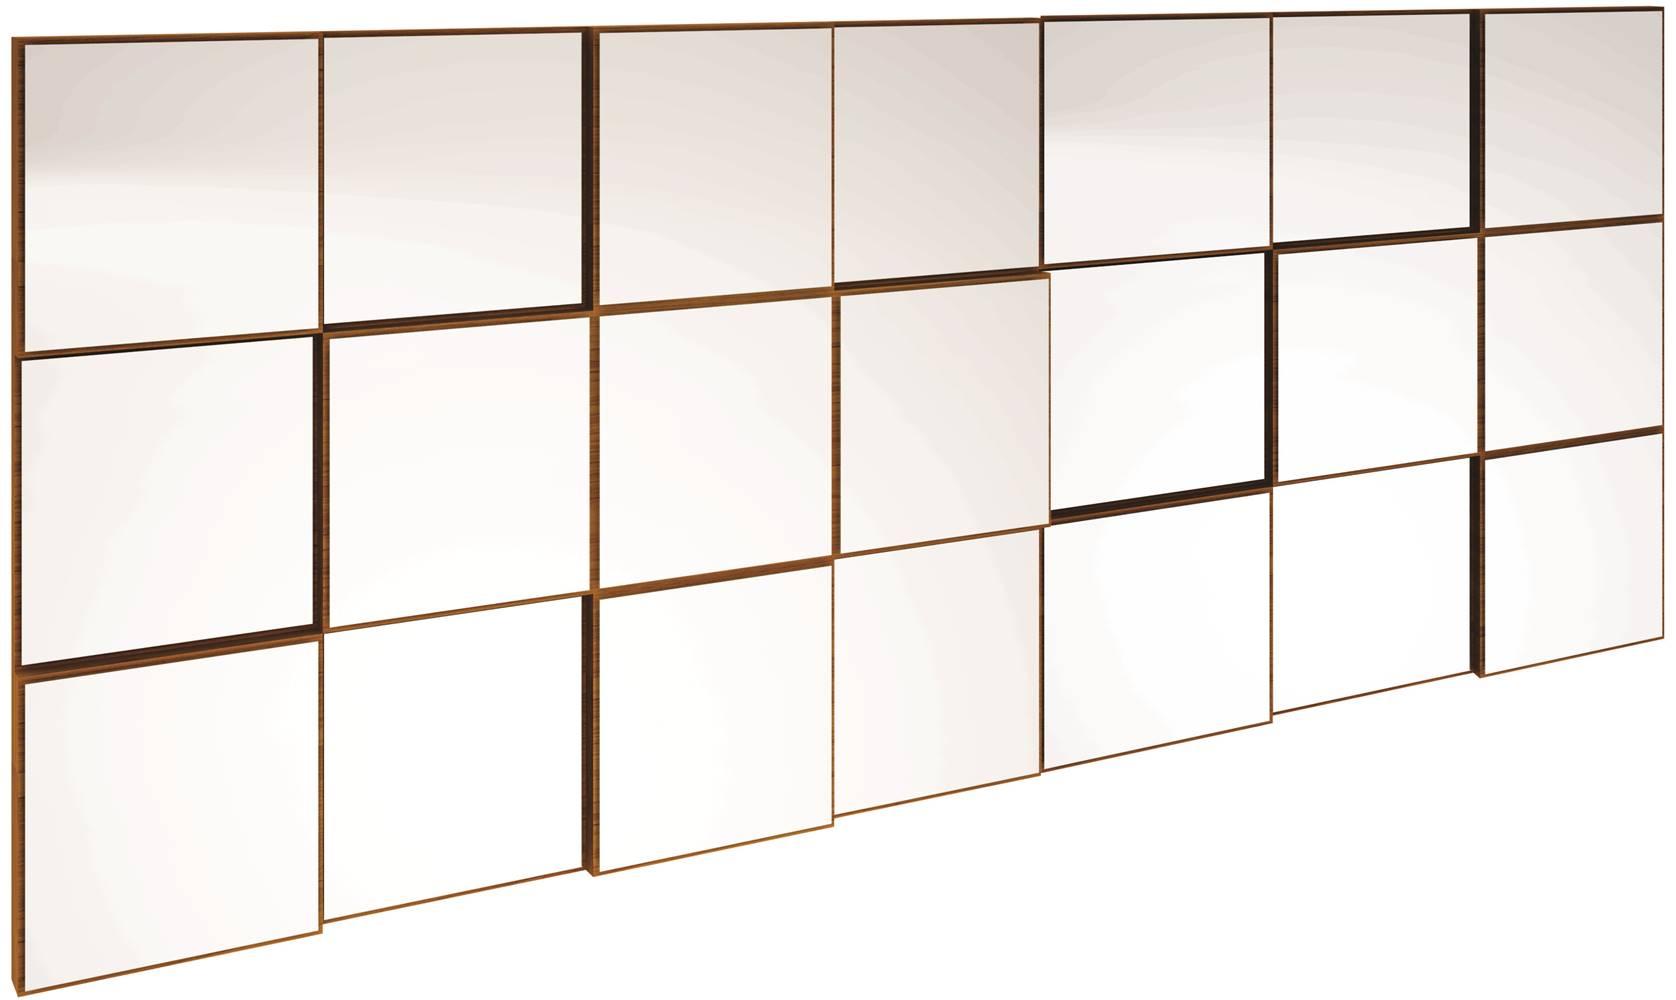 Quadro Espelho Block Extra Grande 1,75 MT (LARG) cor Freijo - 39580